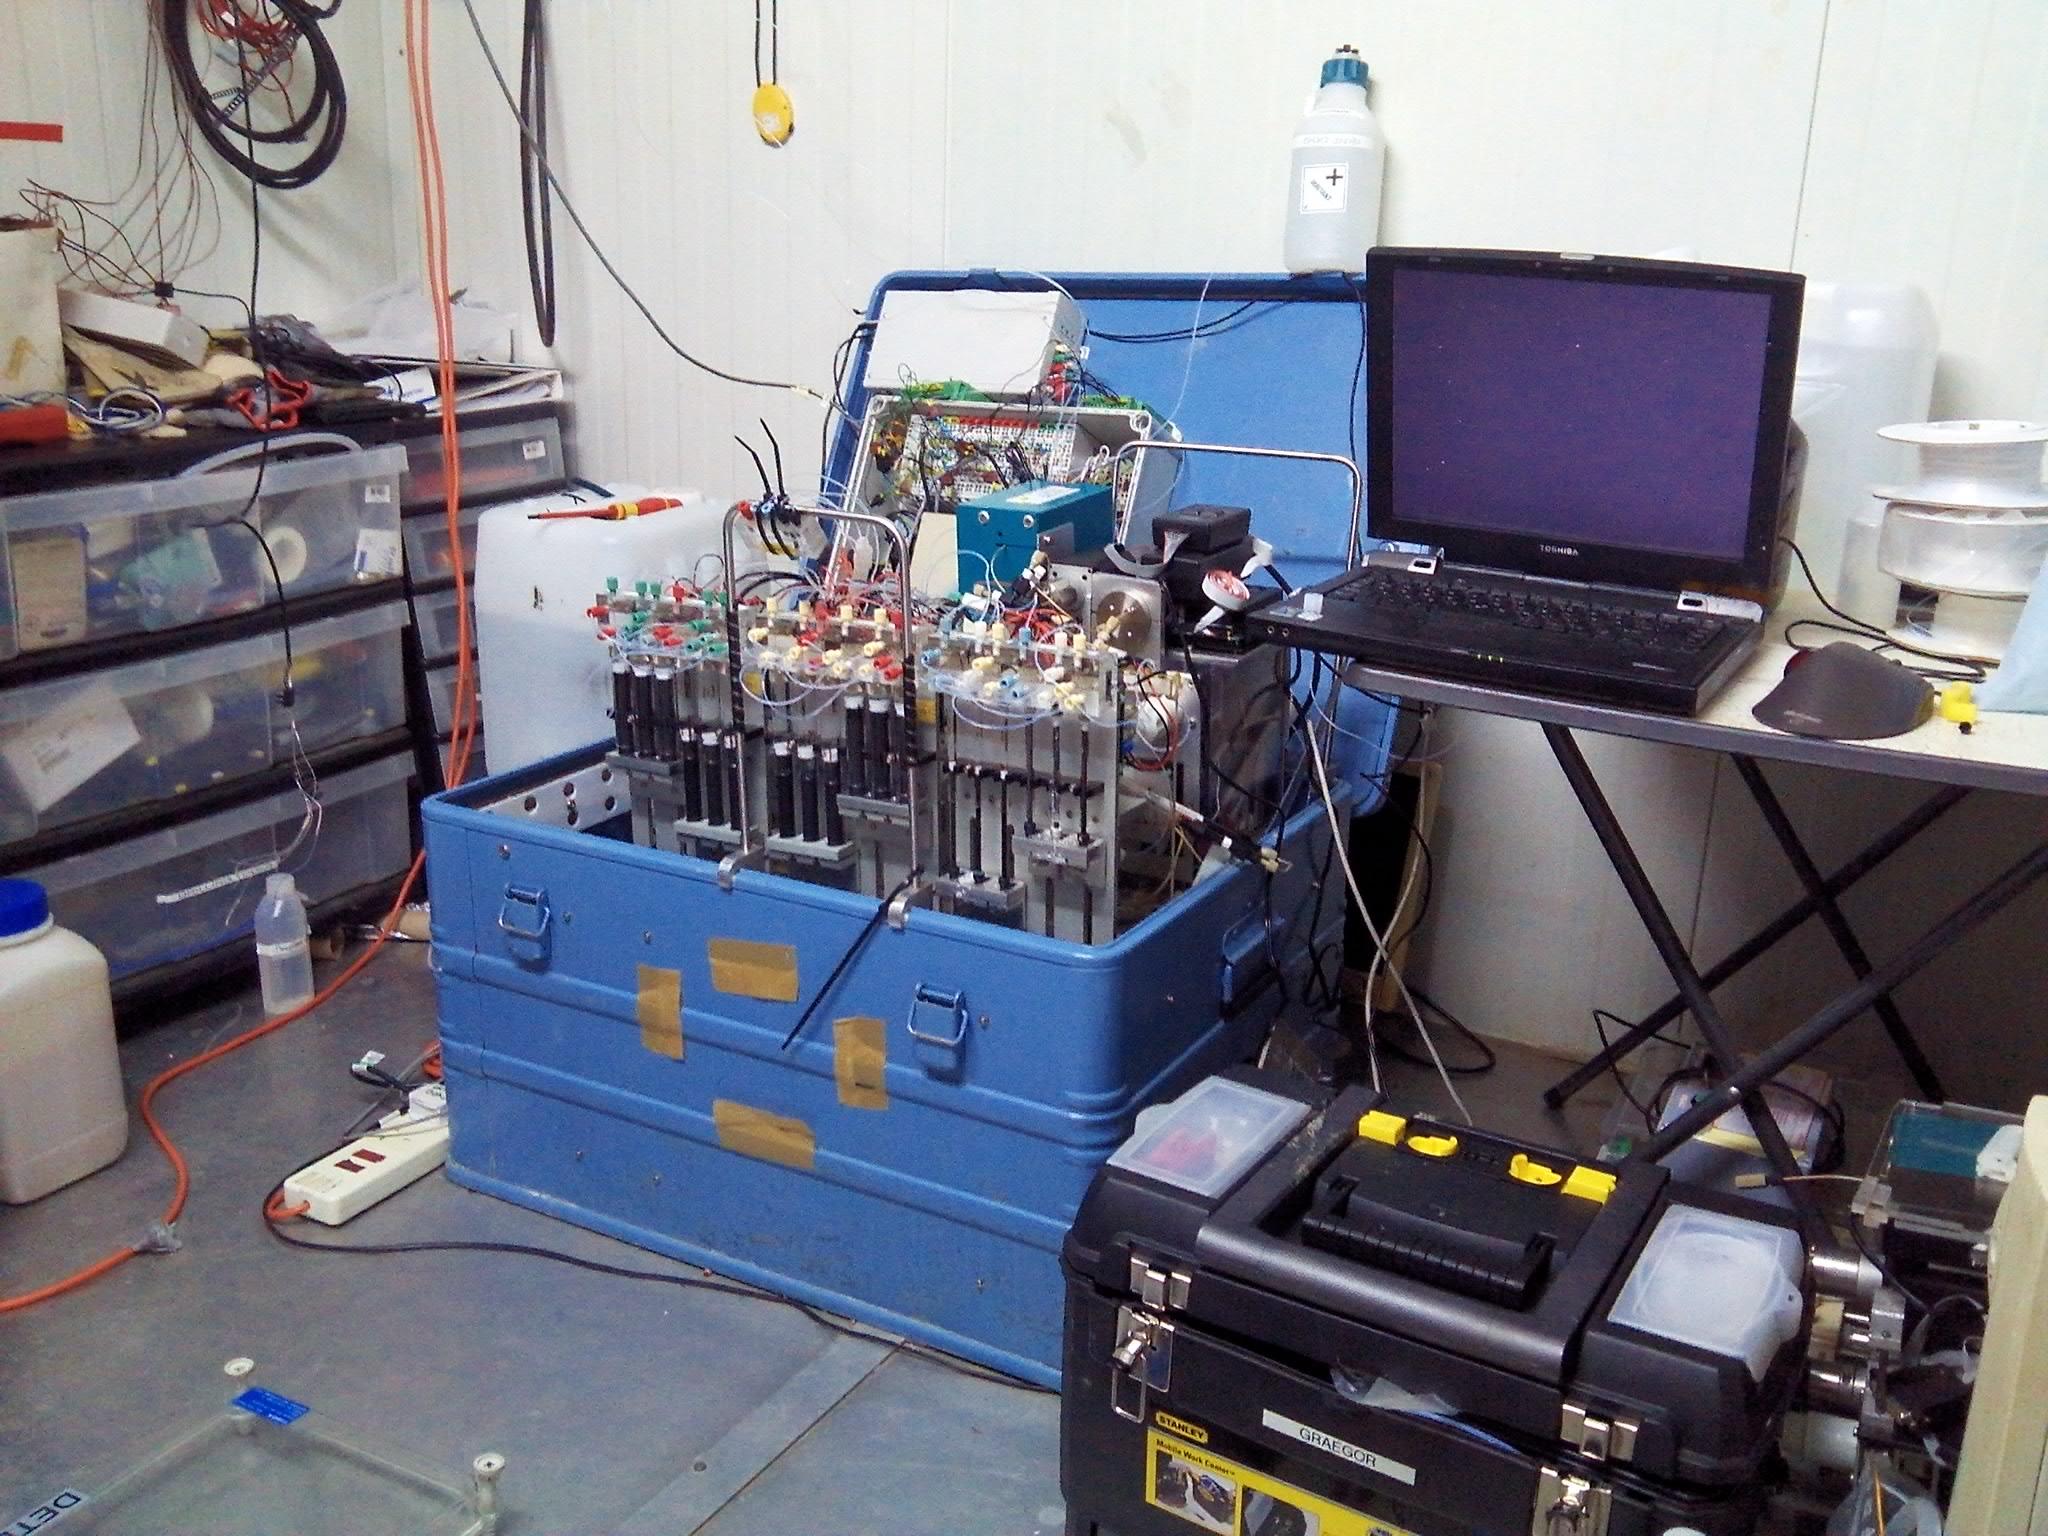 GRAEGOR Detektoreinheit im Laborcontainer. © Robbie Ramsay / University of Edinburgh